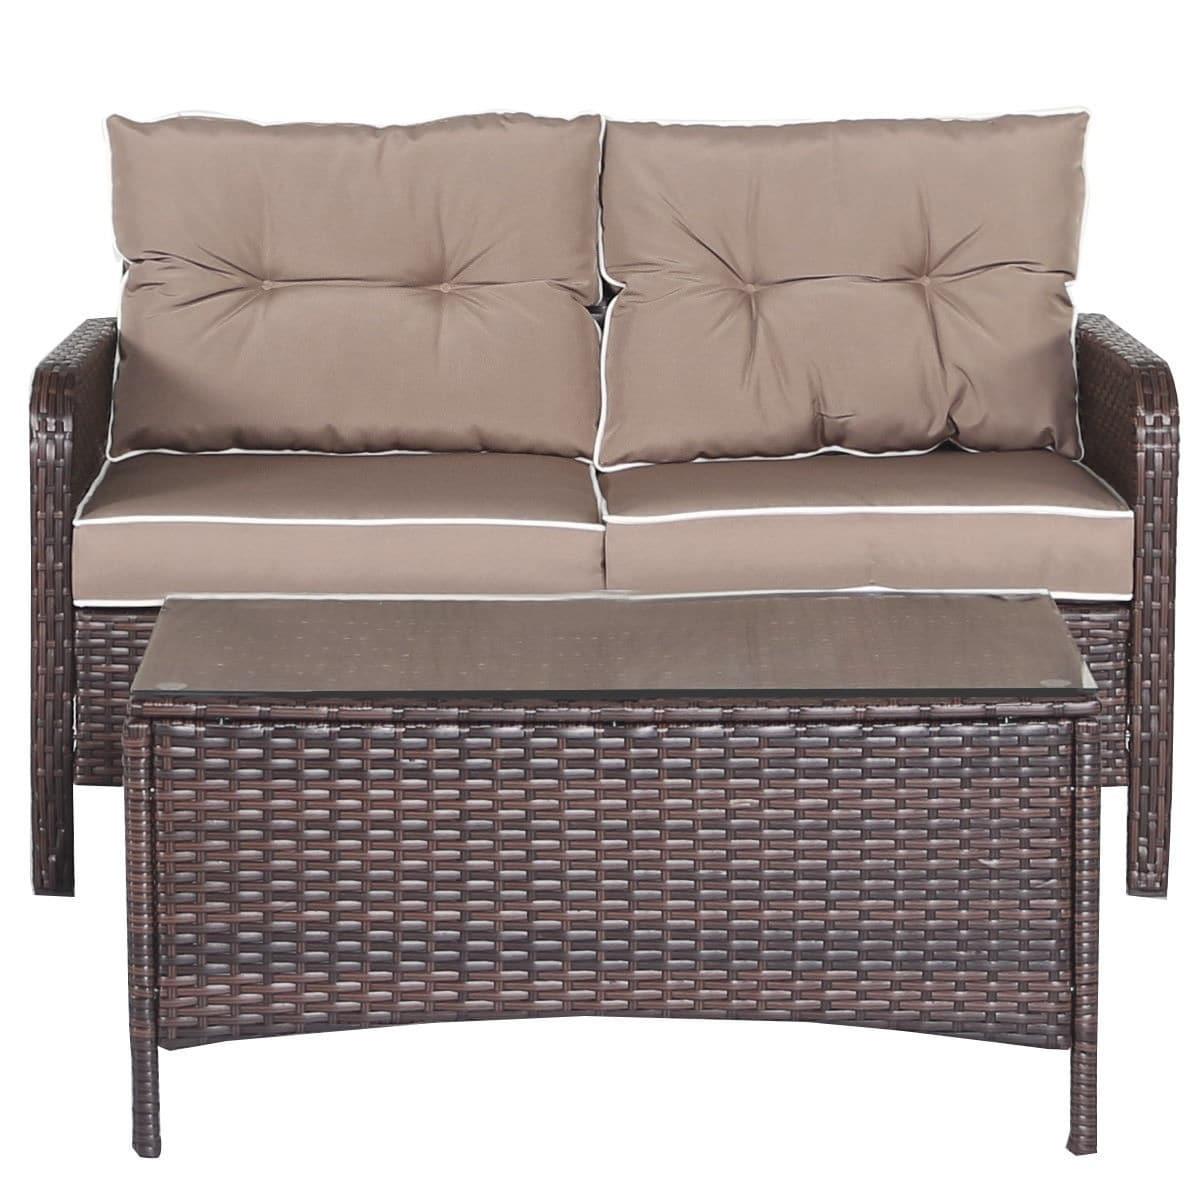 Shop Costway 4 Pcs Outdoor Patio Rattan Wicker Furniture Set Sofa